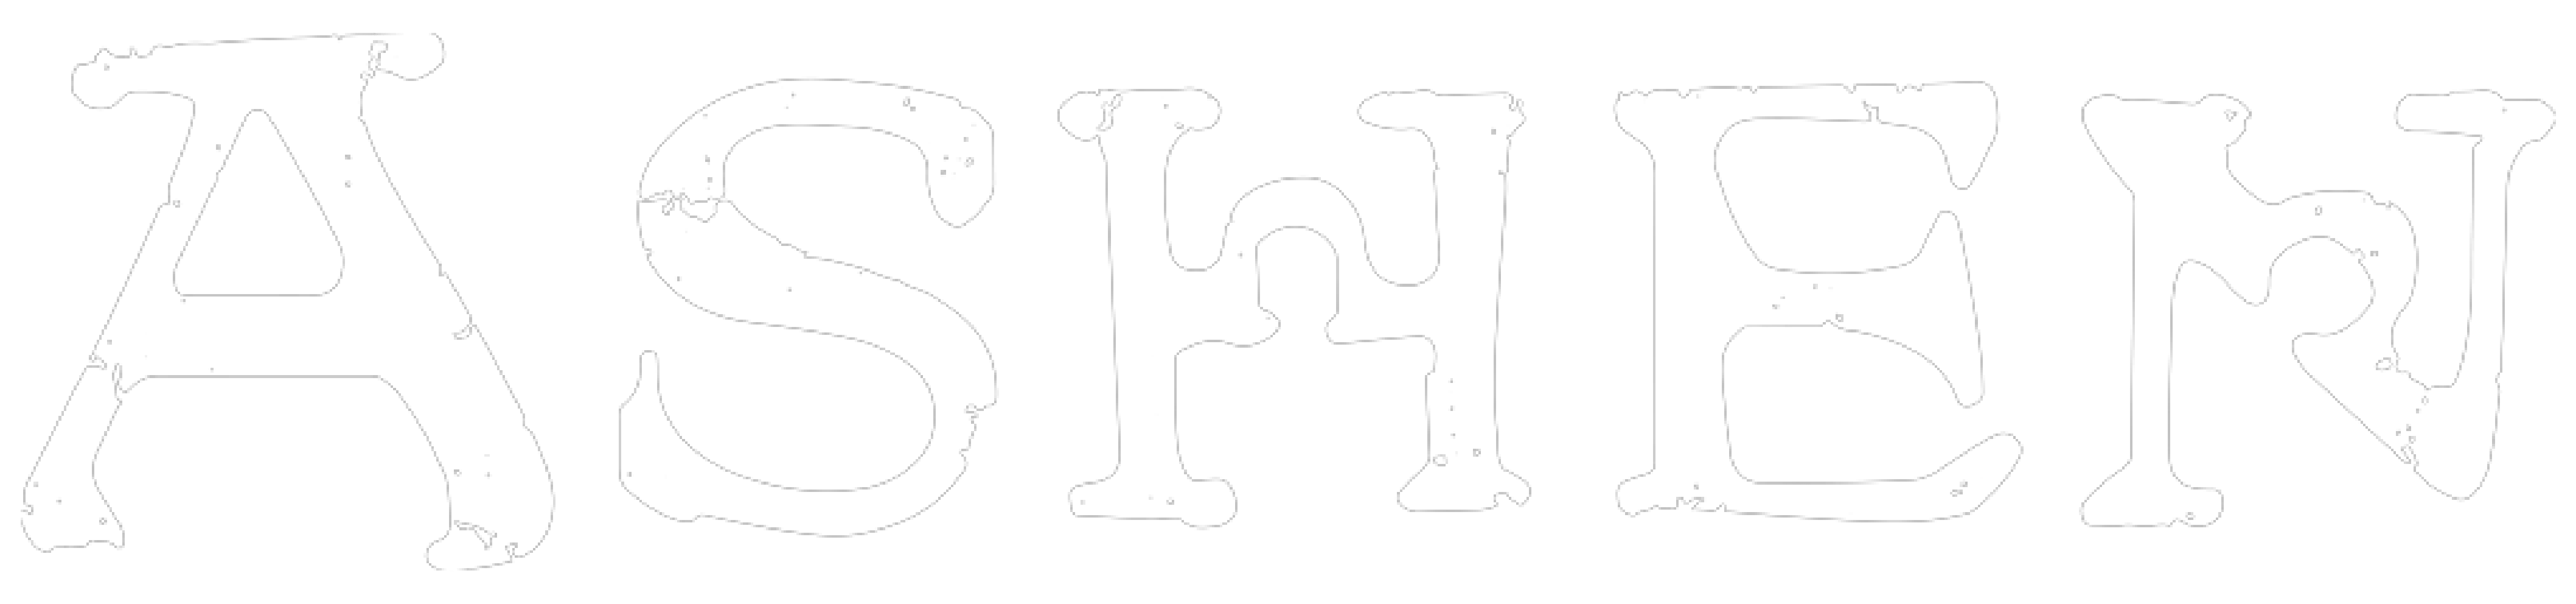 Ashen Logo